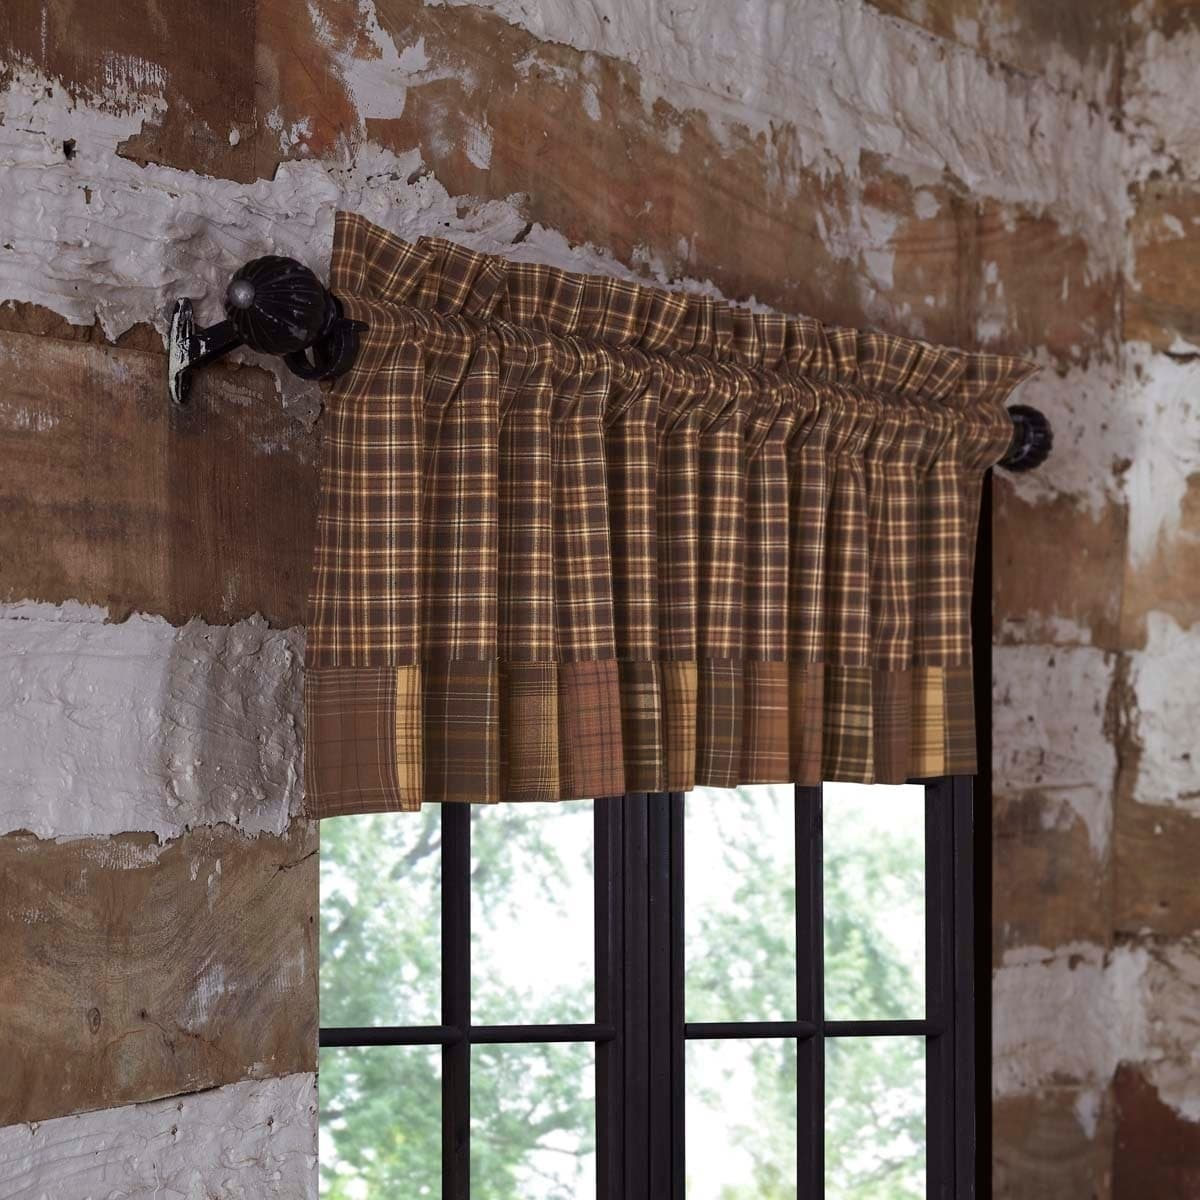 Brown Rustic Kitchen Curtains VHC Prescott Valance Rod Pocket Cotton Plaid  Patchwork - Valance 16x72